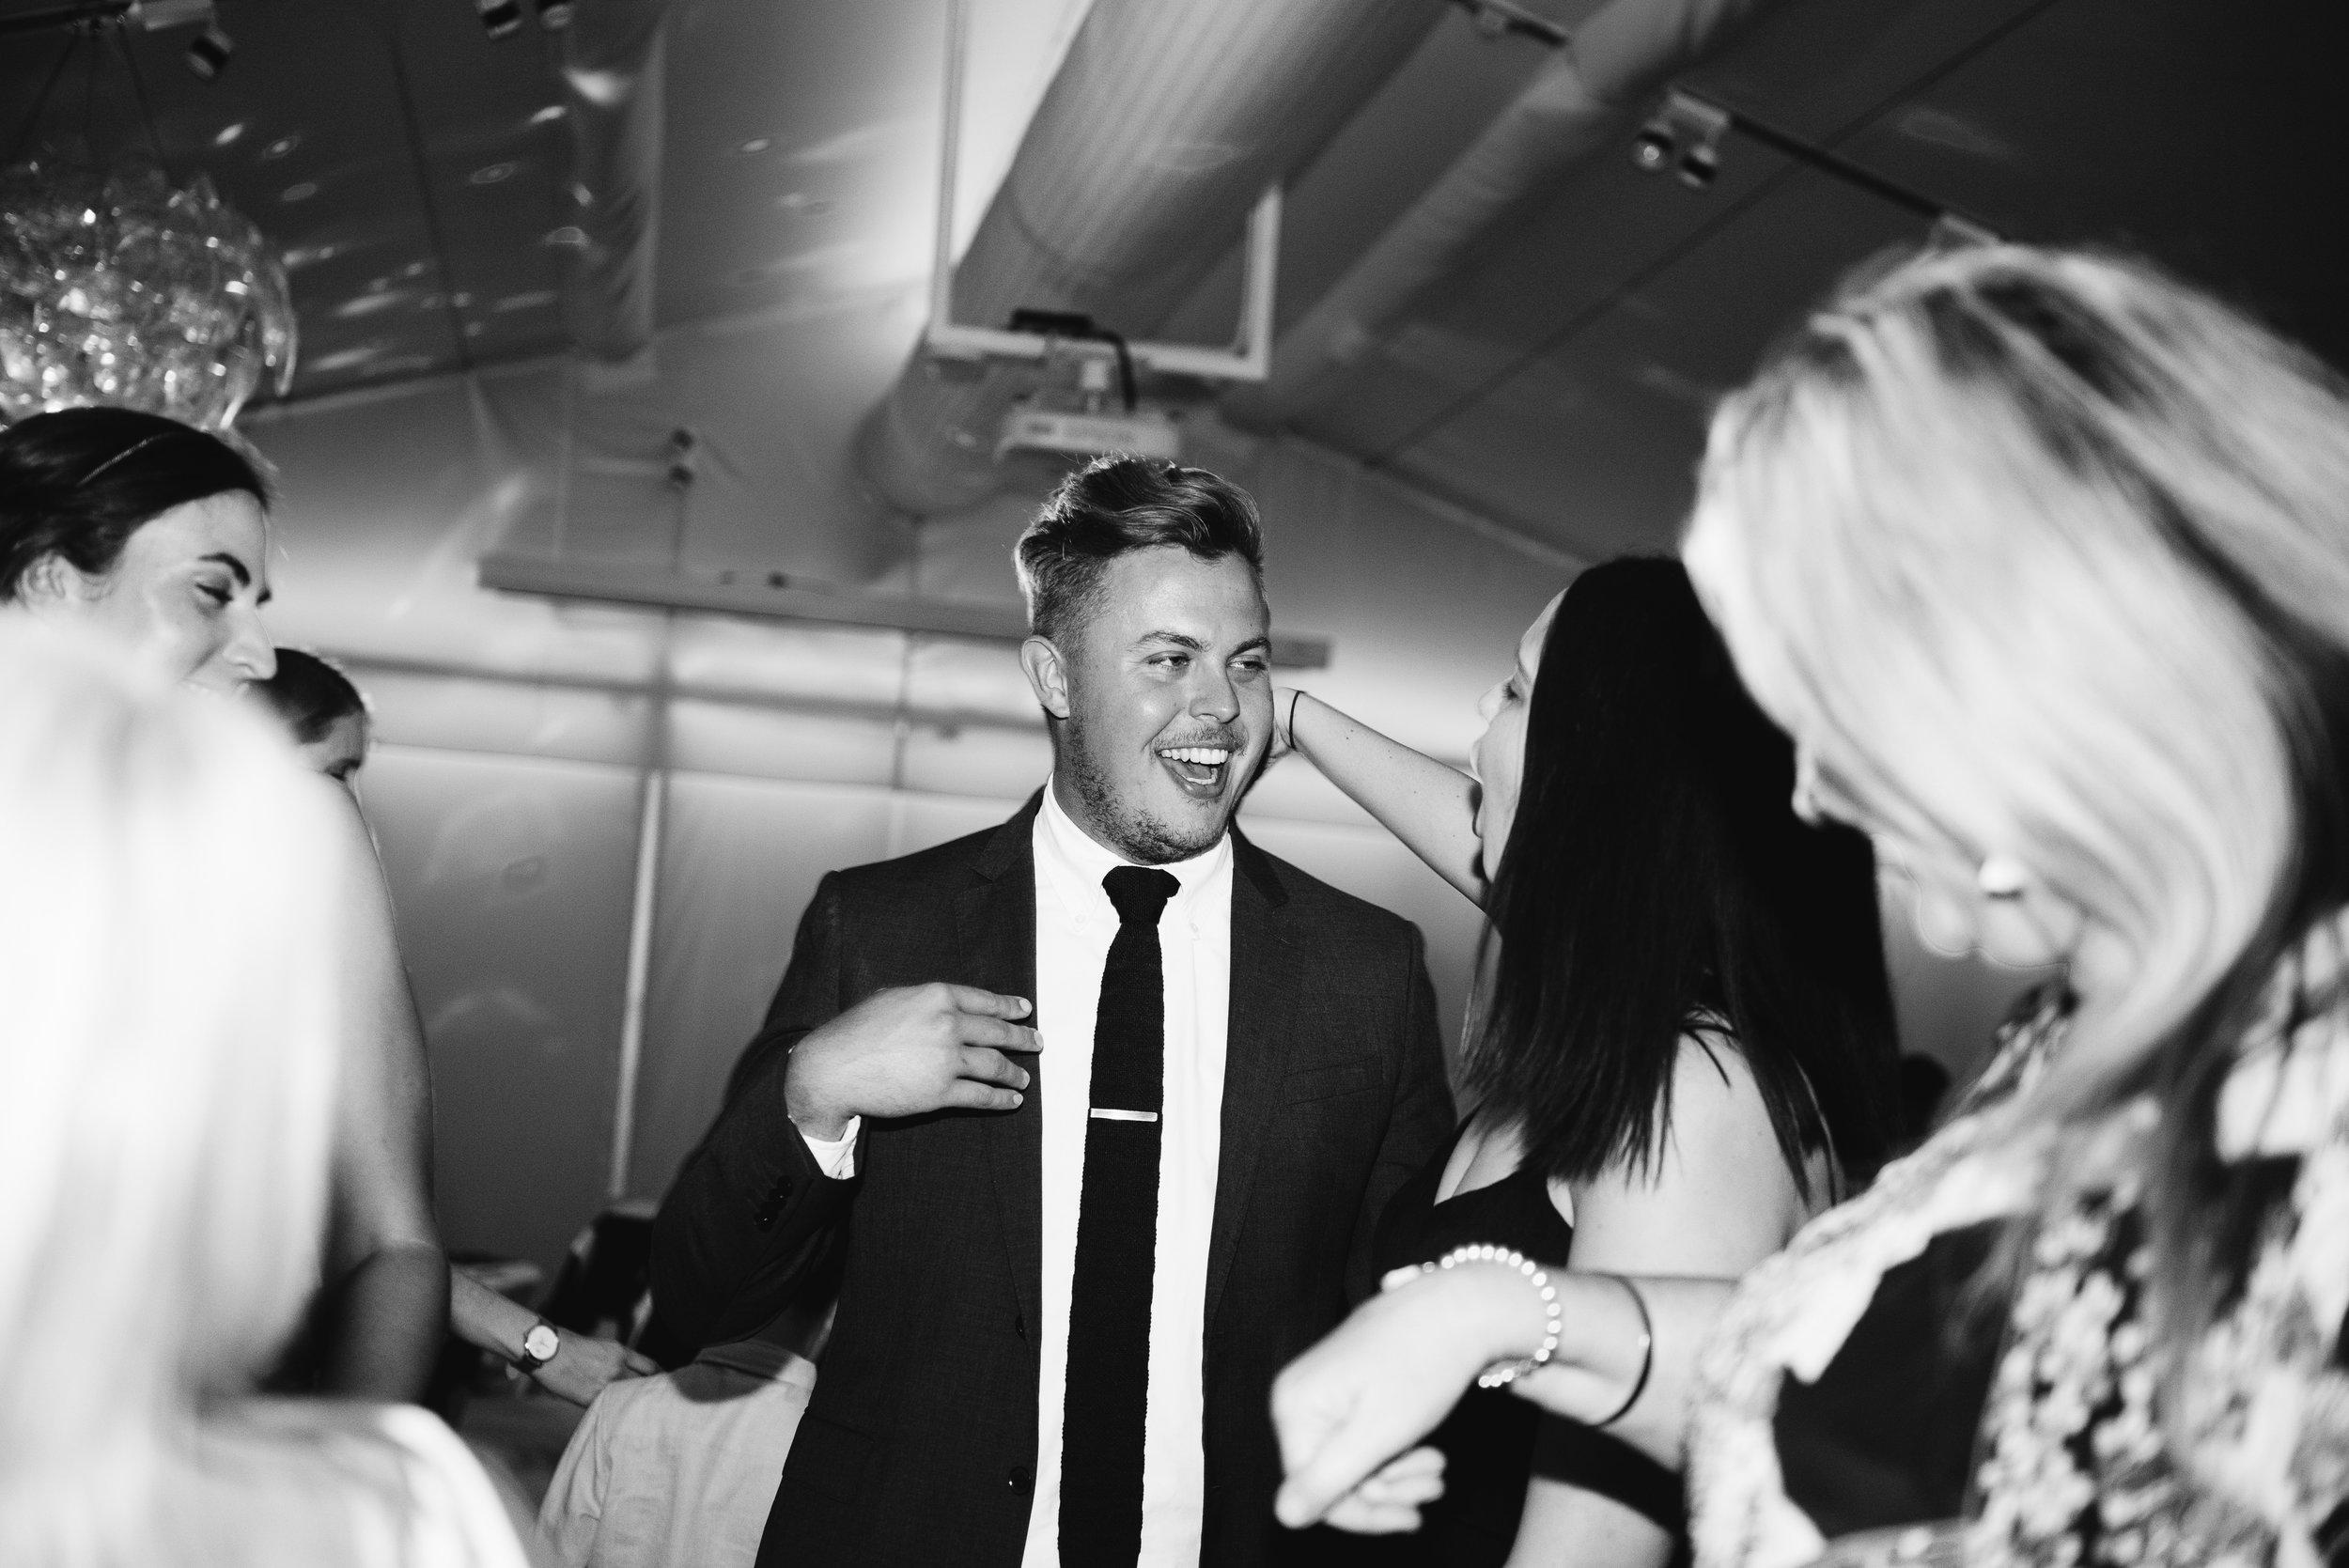 brisbane-wedding-photographer-152.jpg